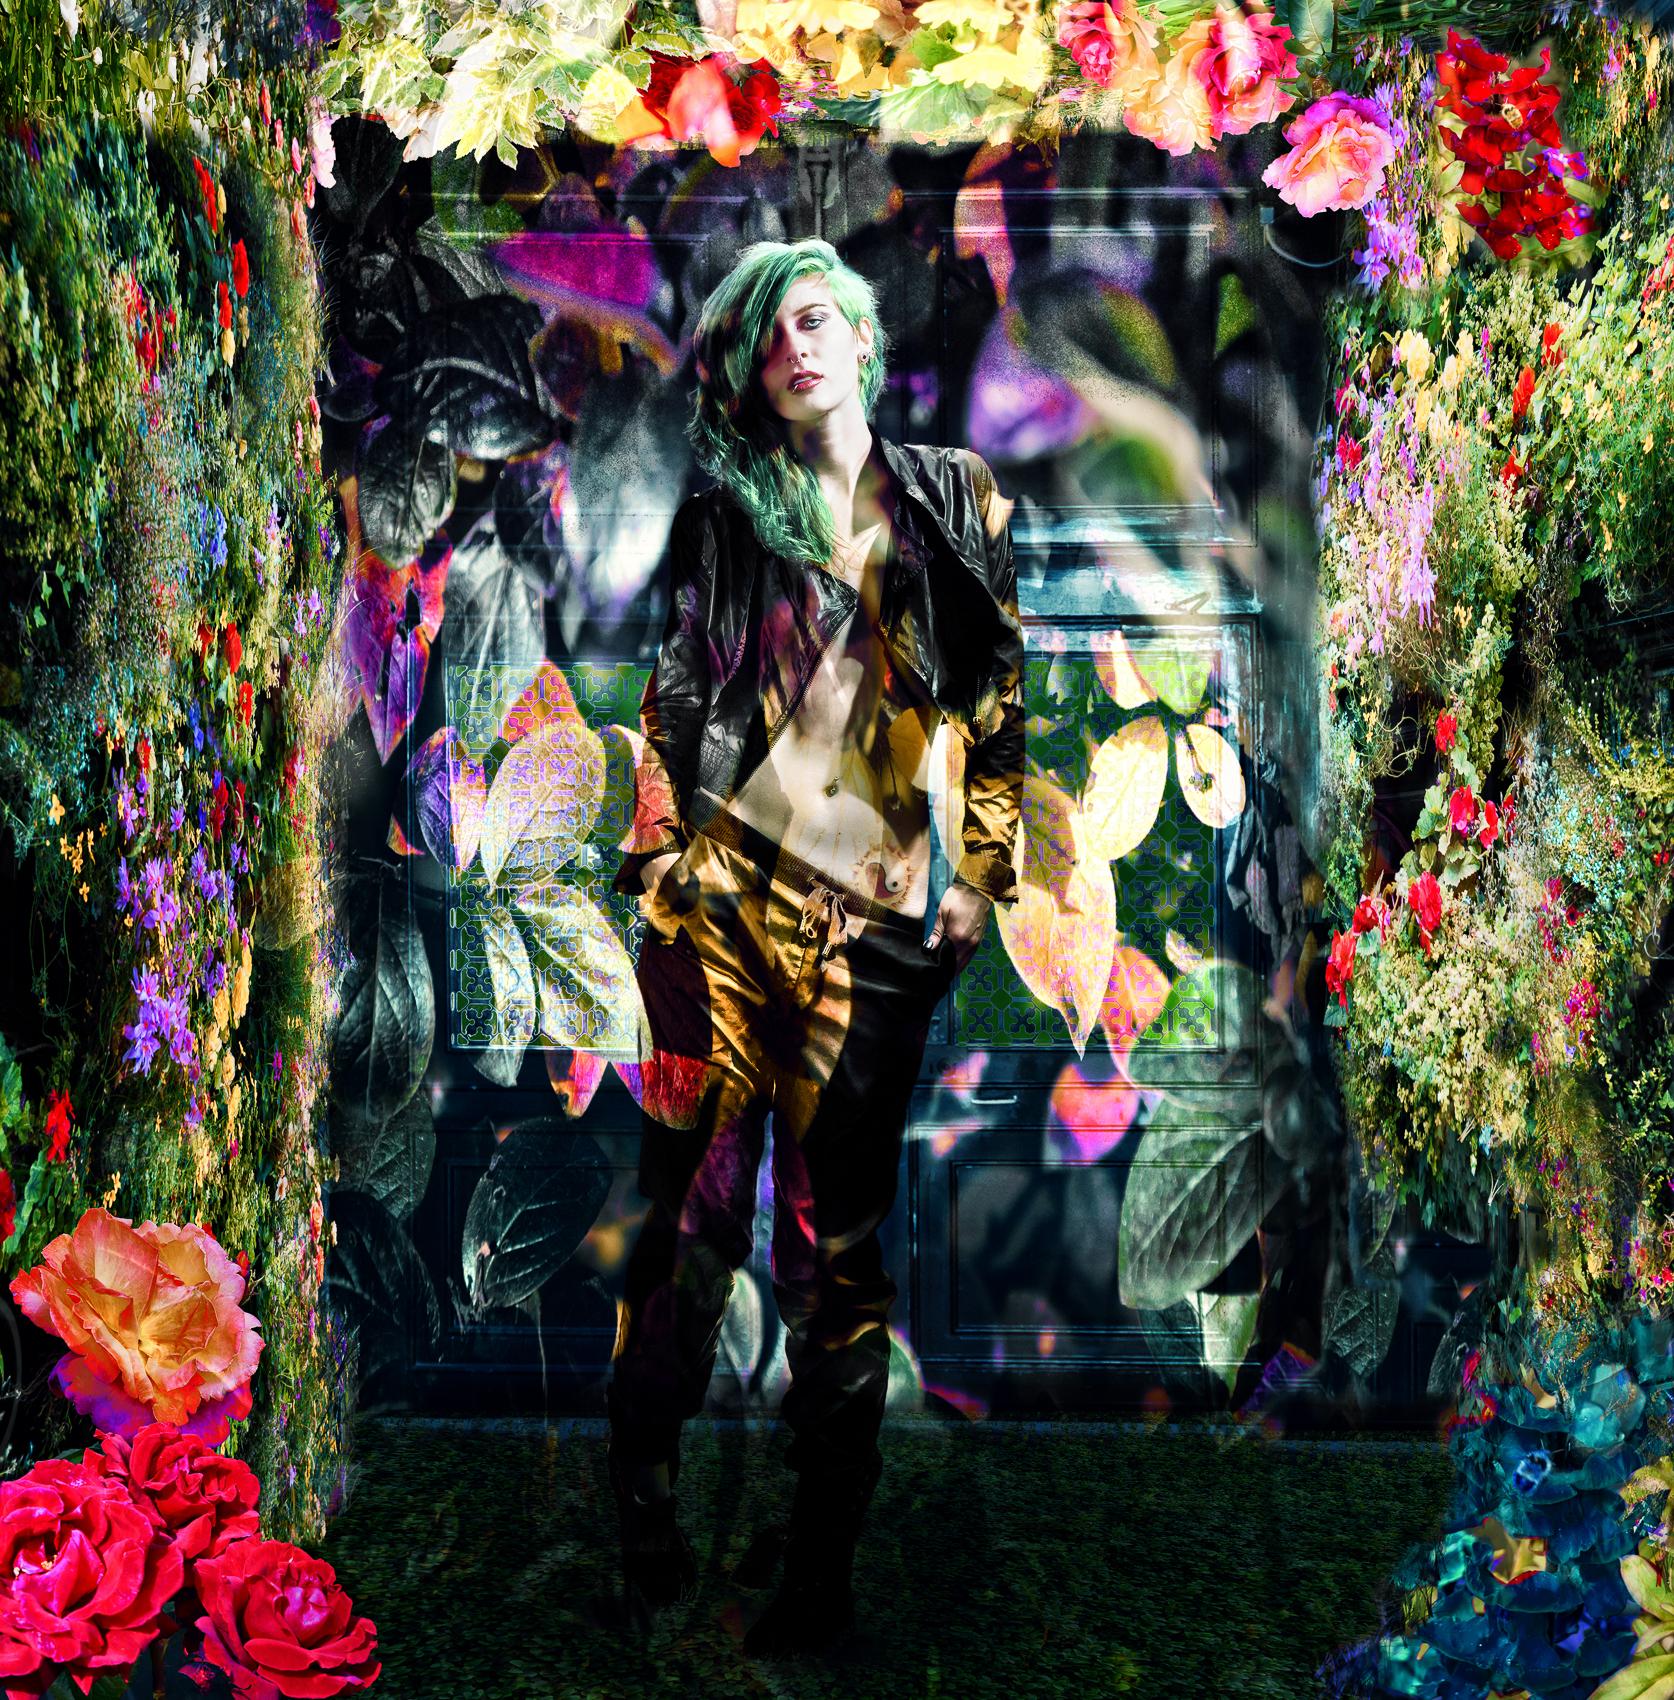 2015-08-23 Emmy Grimes Dark Beauty-440-Edit.jpg